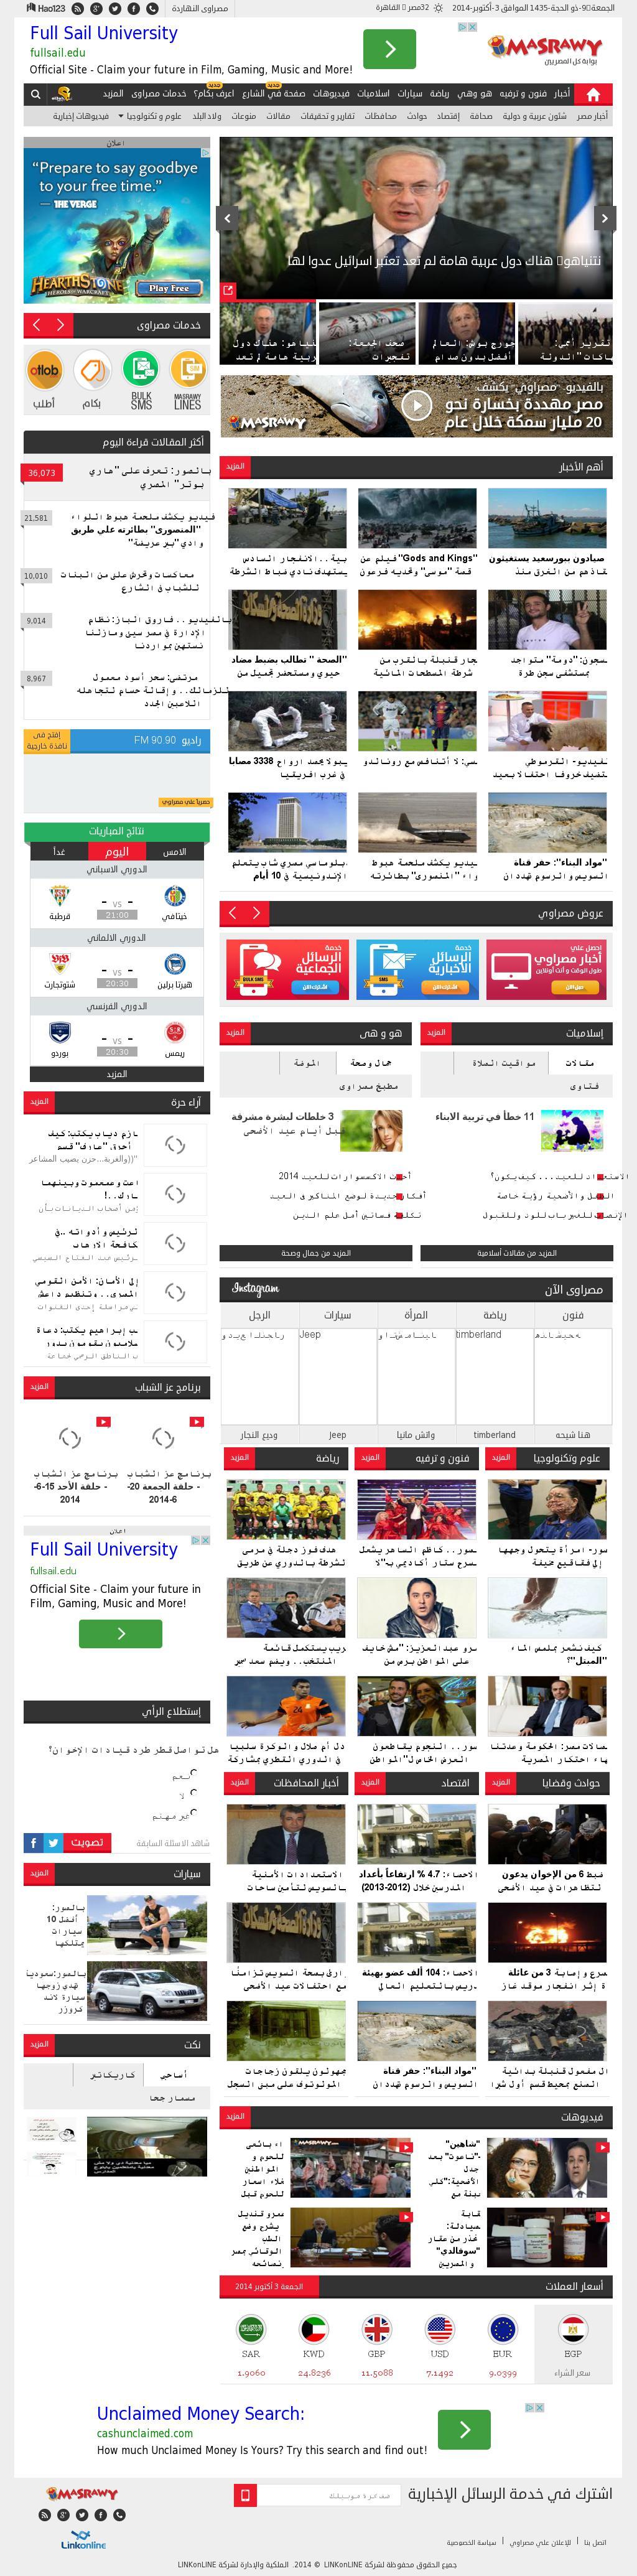 Masrawy at Friday Oct. 3, 2014, 8:08 a.m. UTC